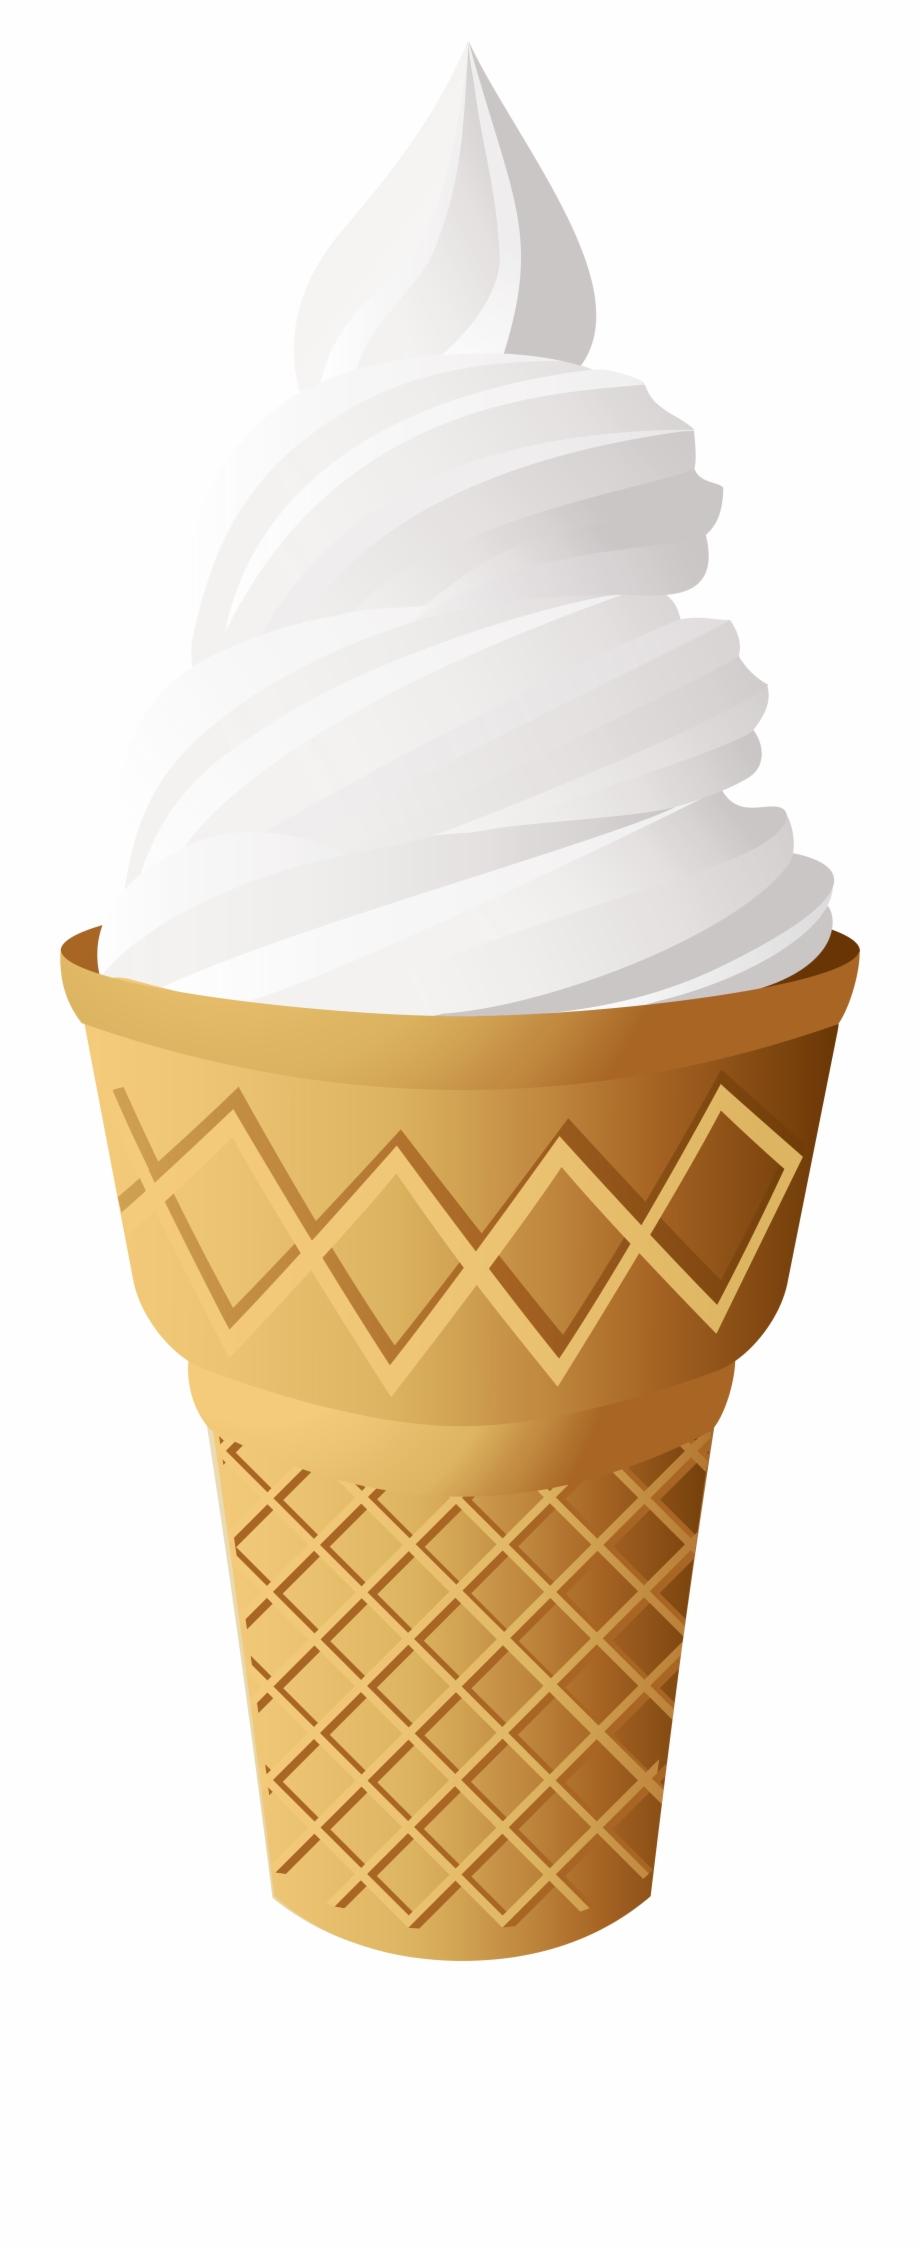 Vanilla Ice Cream Cone Png Clip Art.